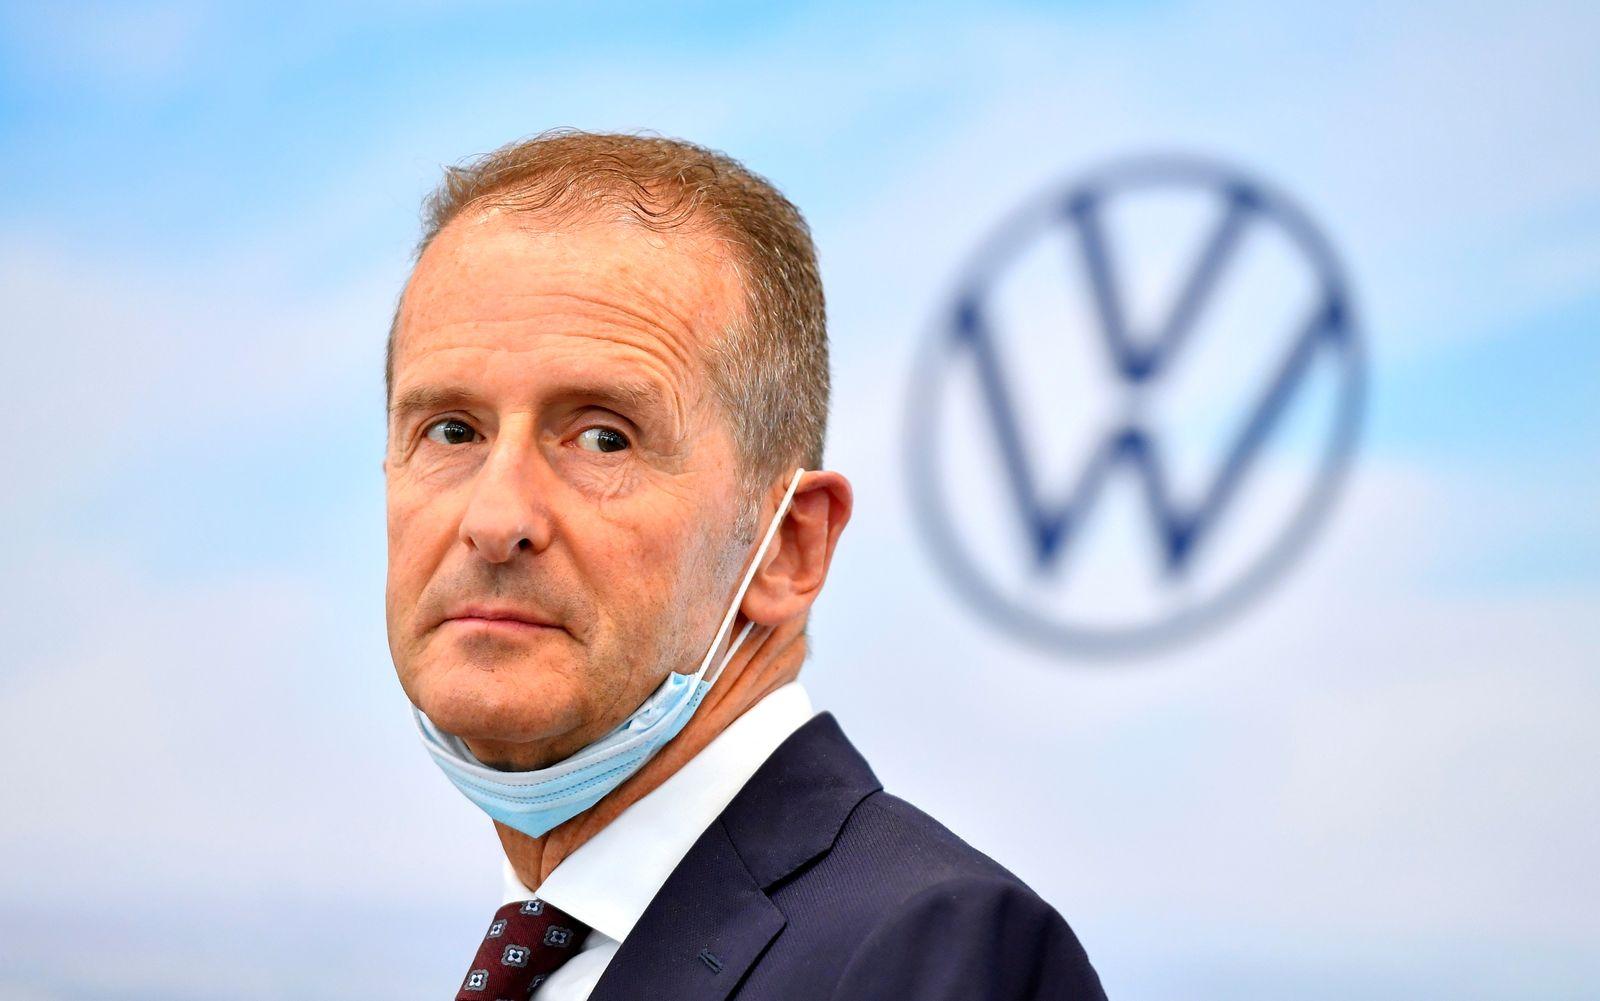 German President Frank-Walter Steinmeier visits Volkswagen plant in Zwickau